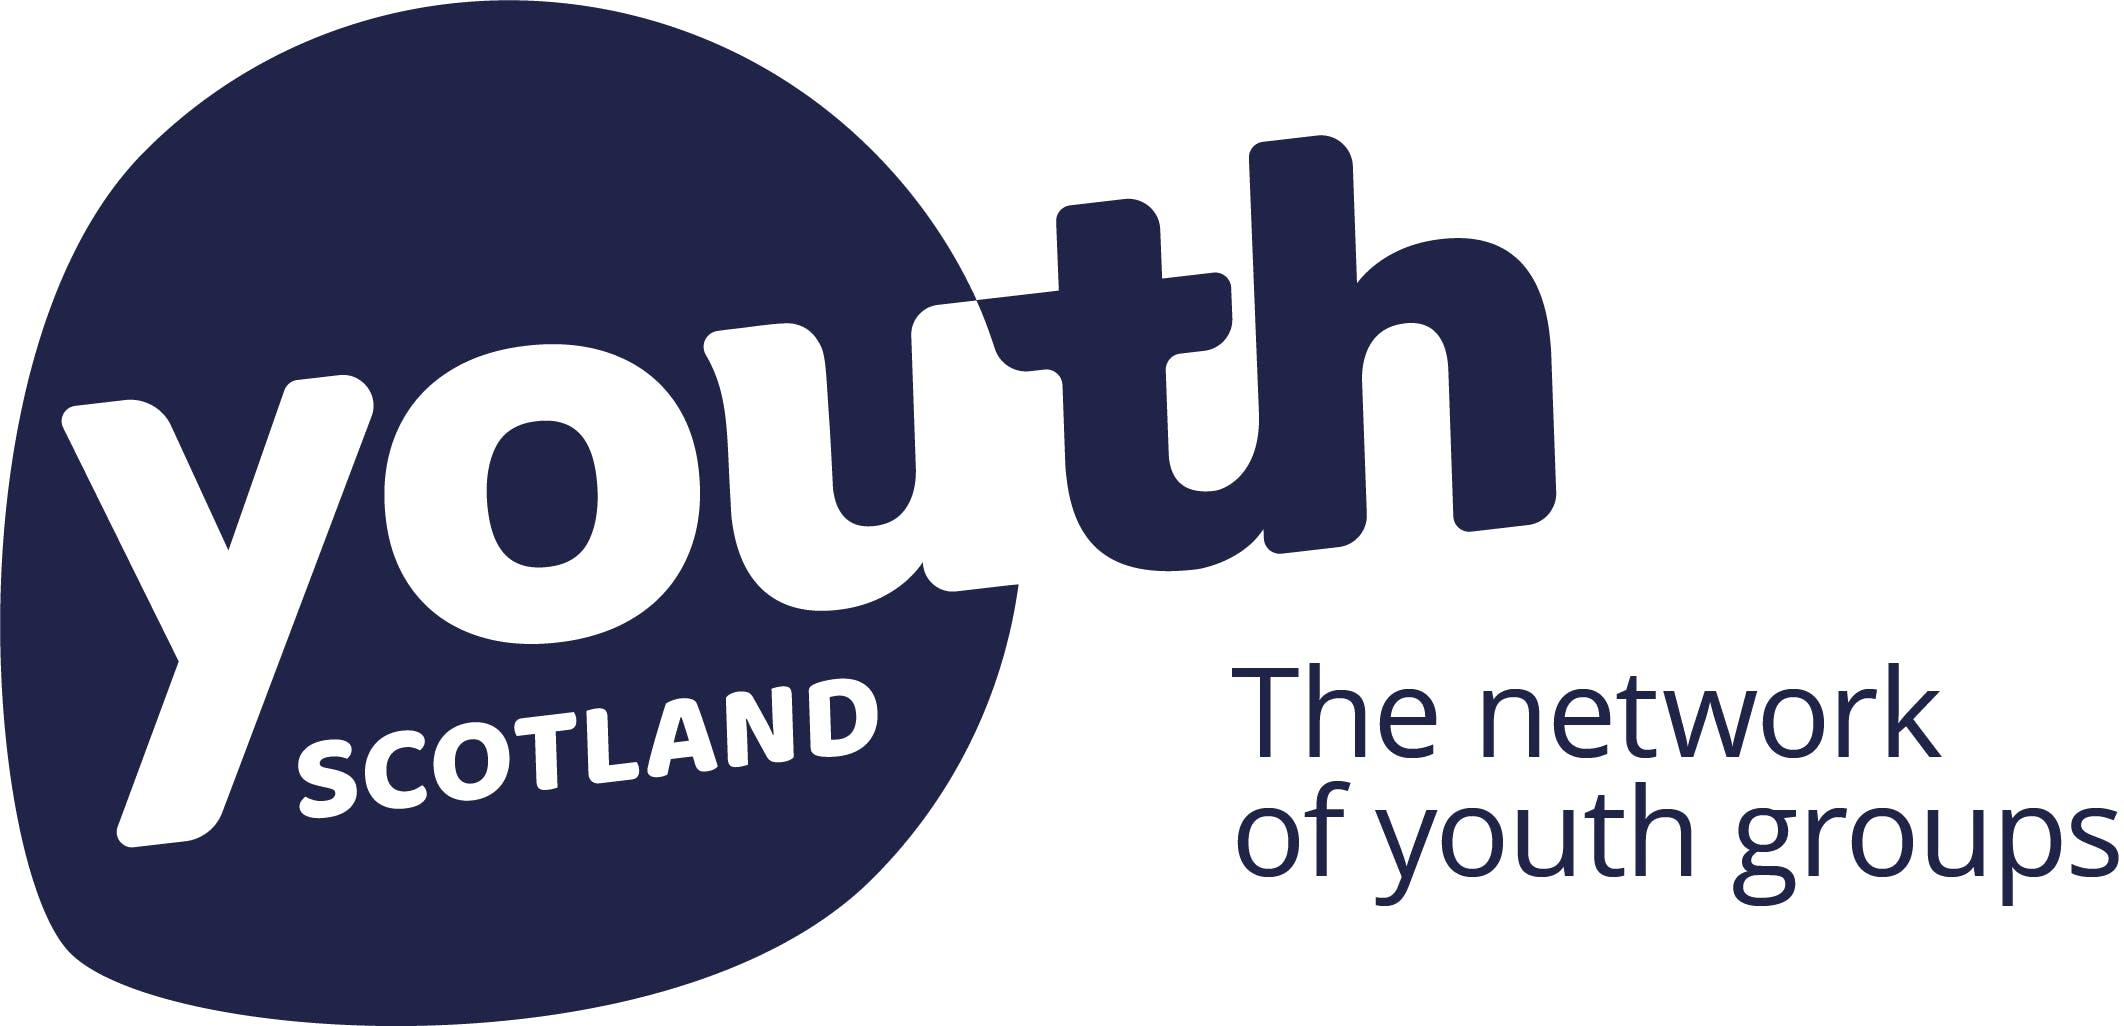 Youth Scotland